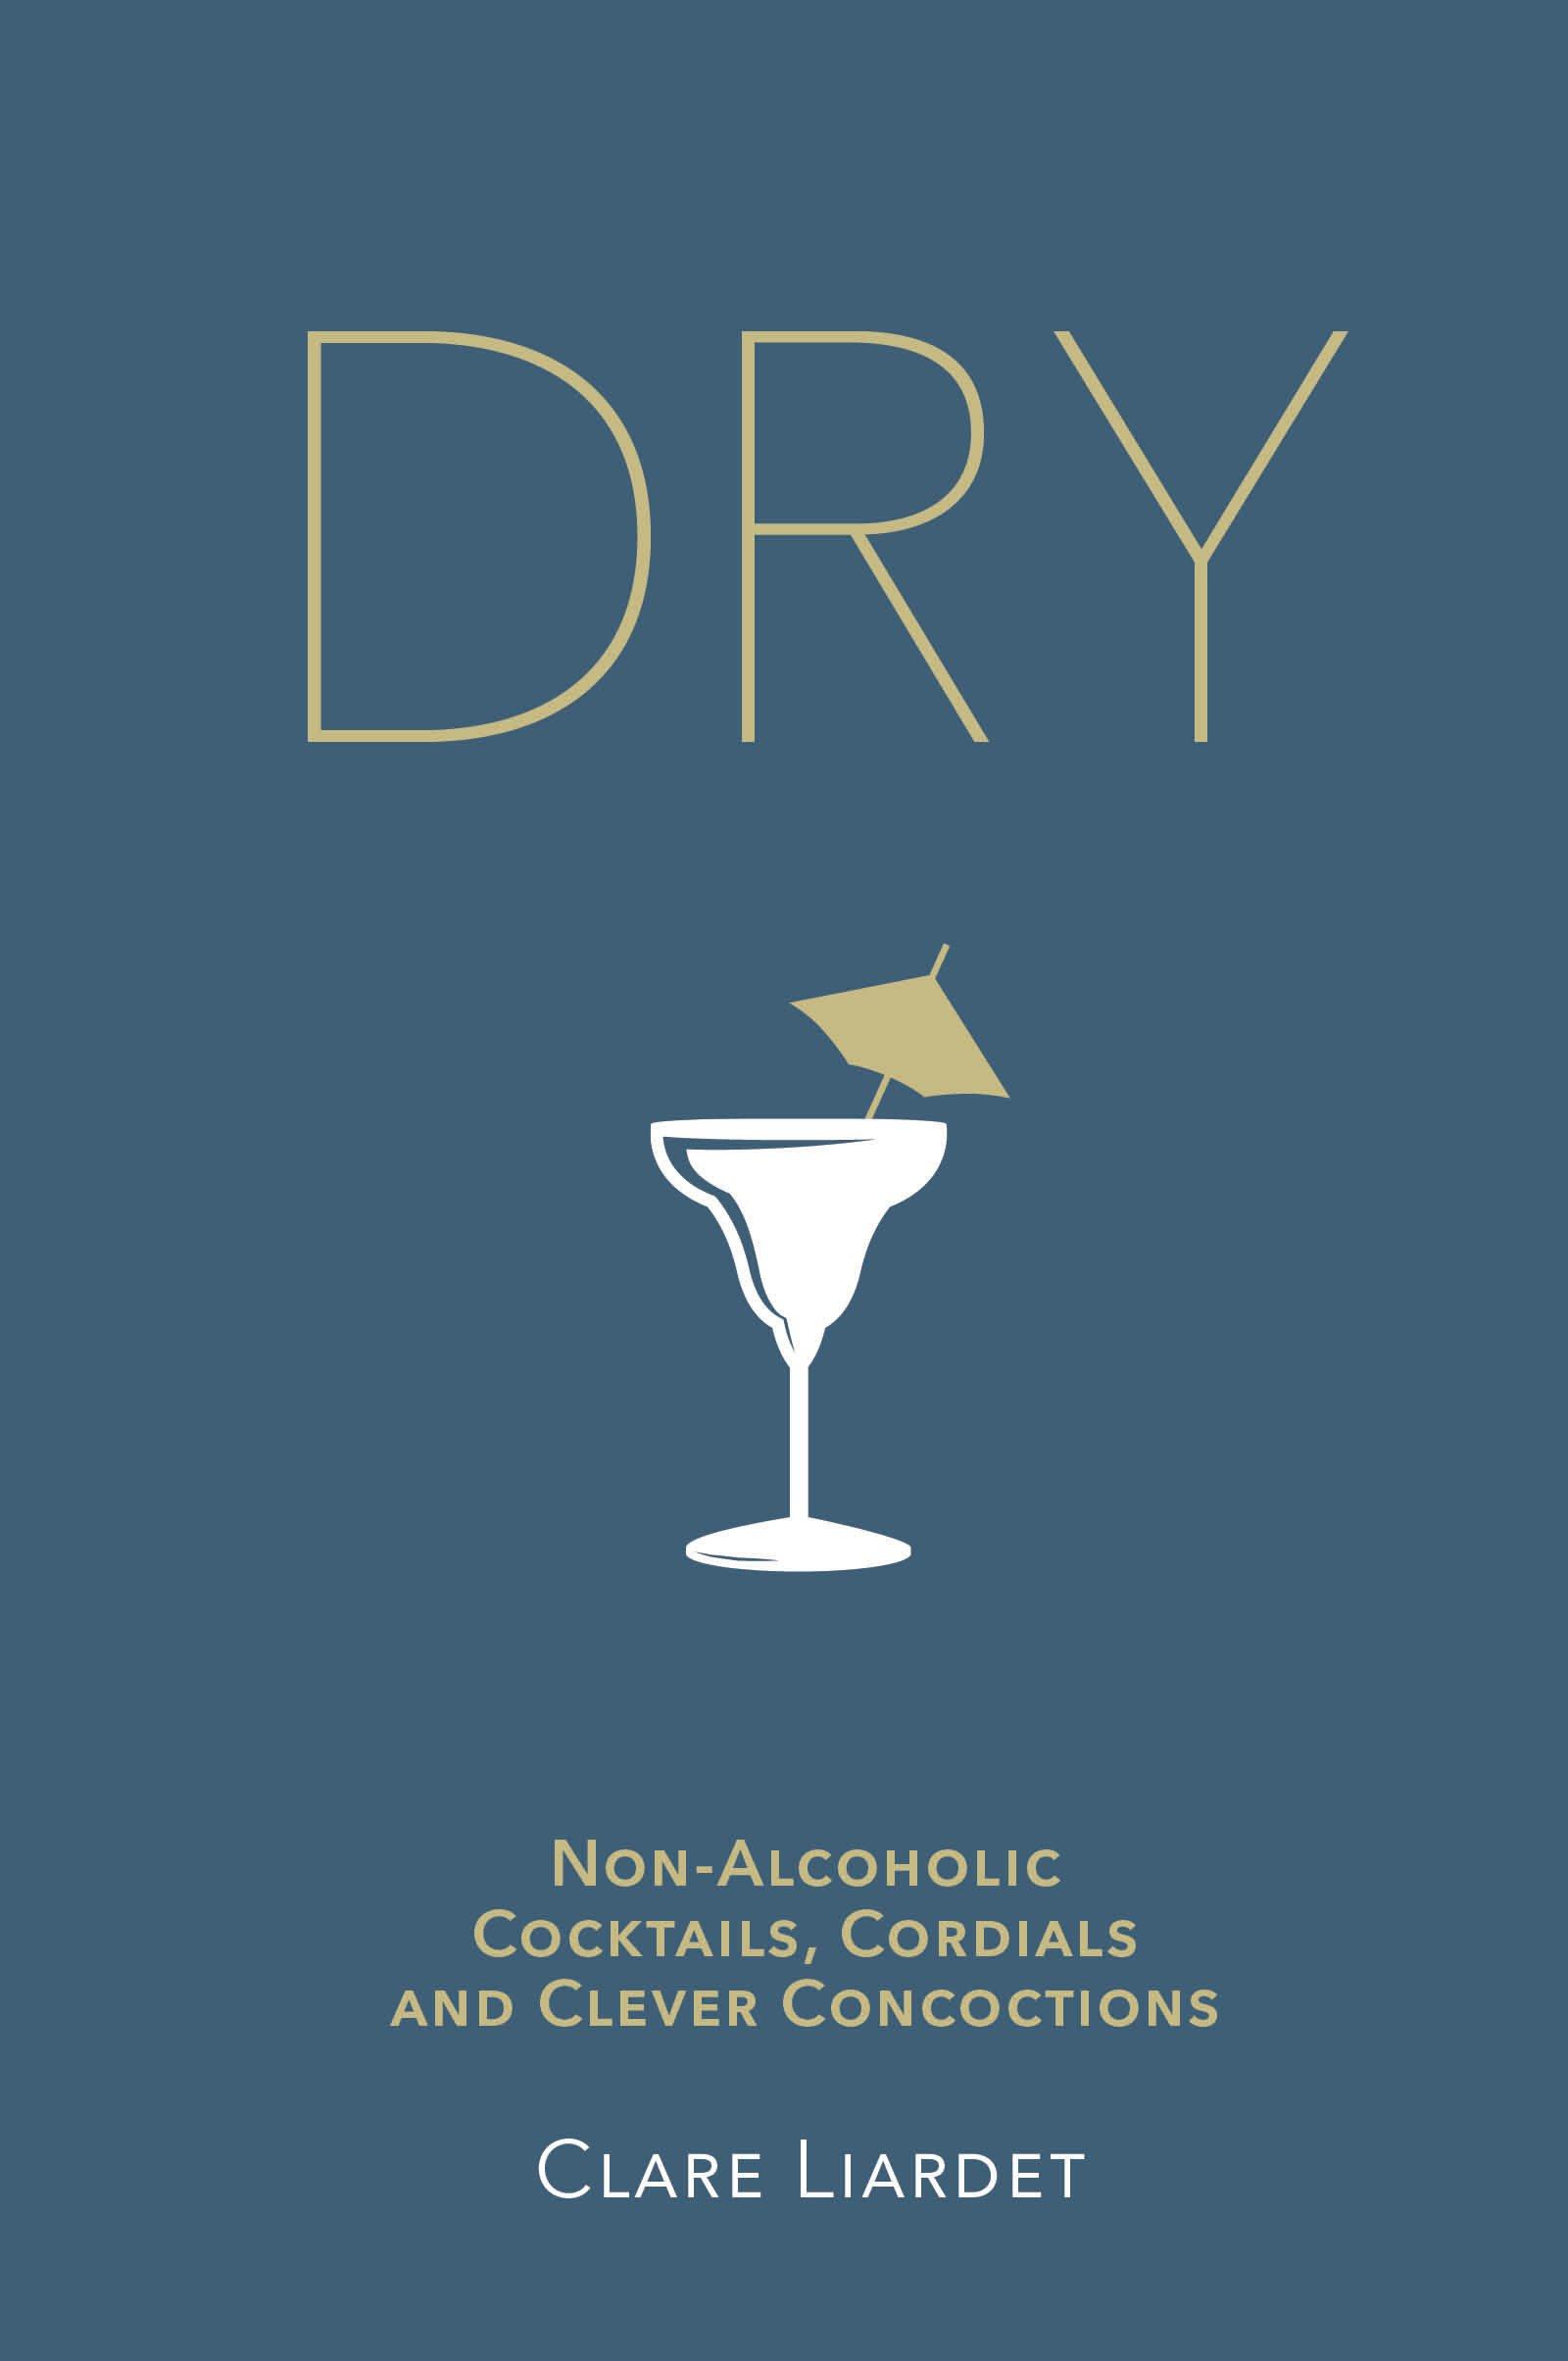 Amazon.com : SEEDLIP Distilled Non-Alcoholic Spirits (Spice 94 ...